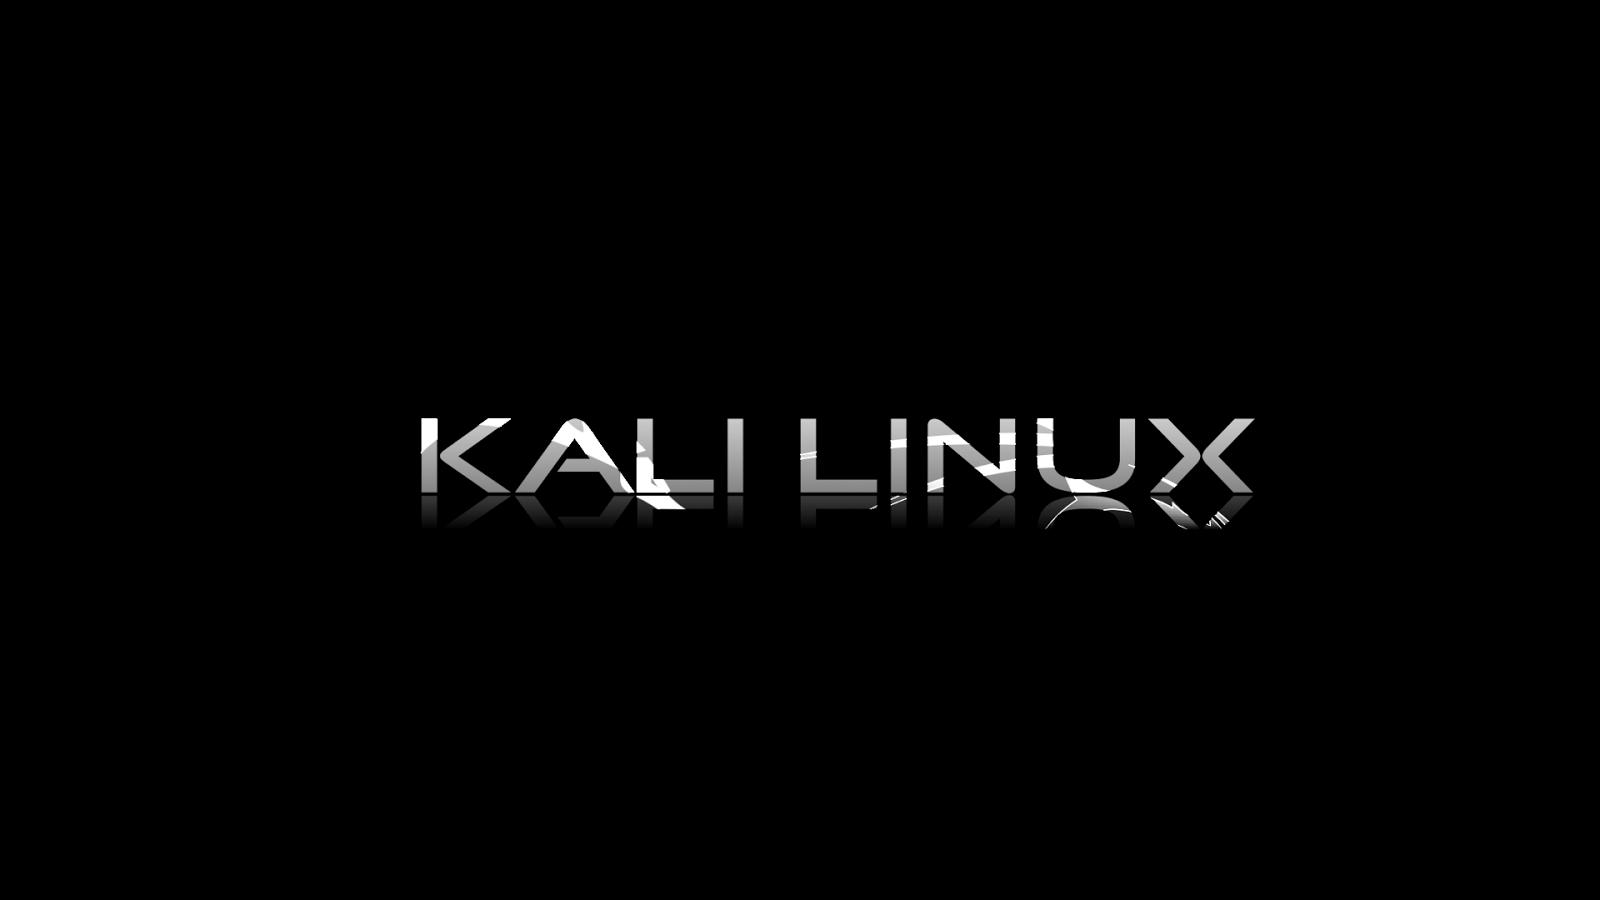 Hướng Dẫn Cách Hack WPA/WPA2 Trên Kali Linux 34